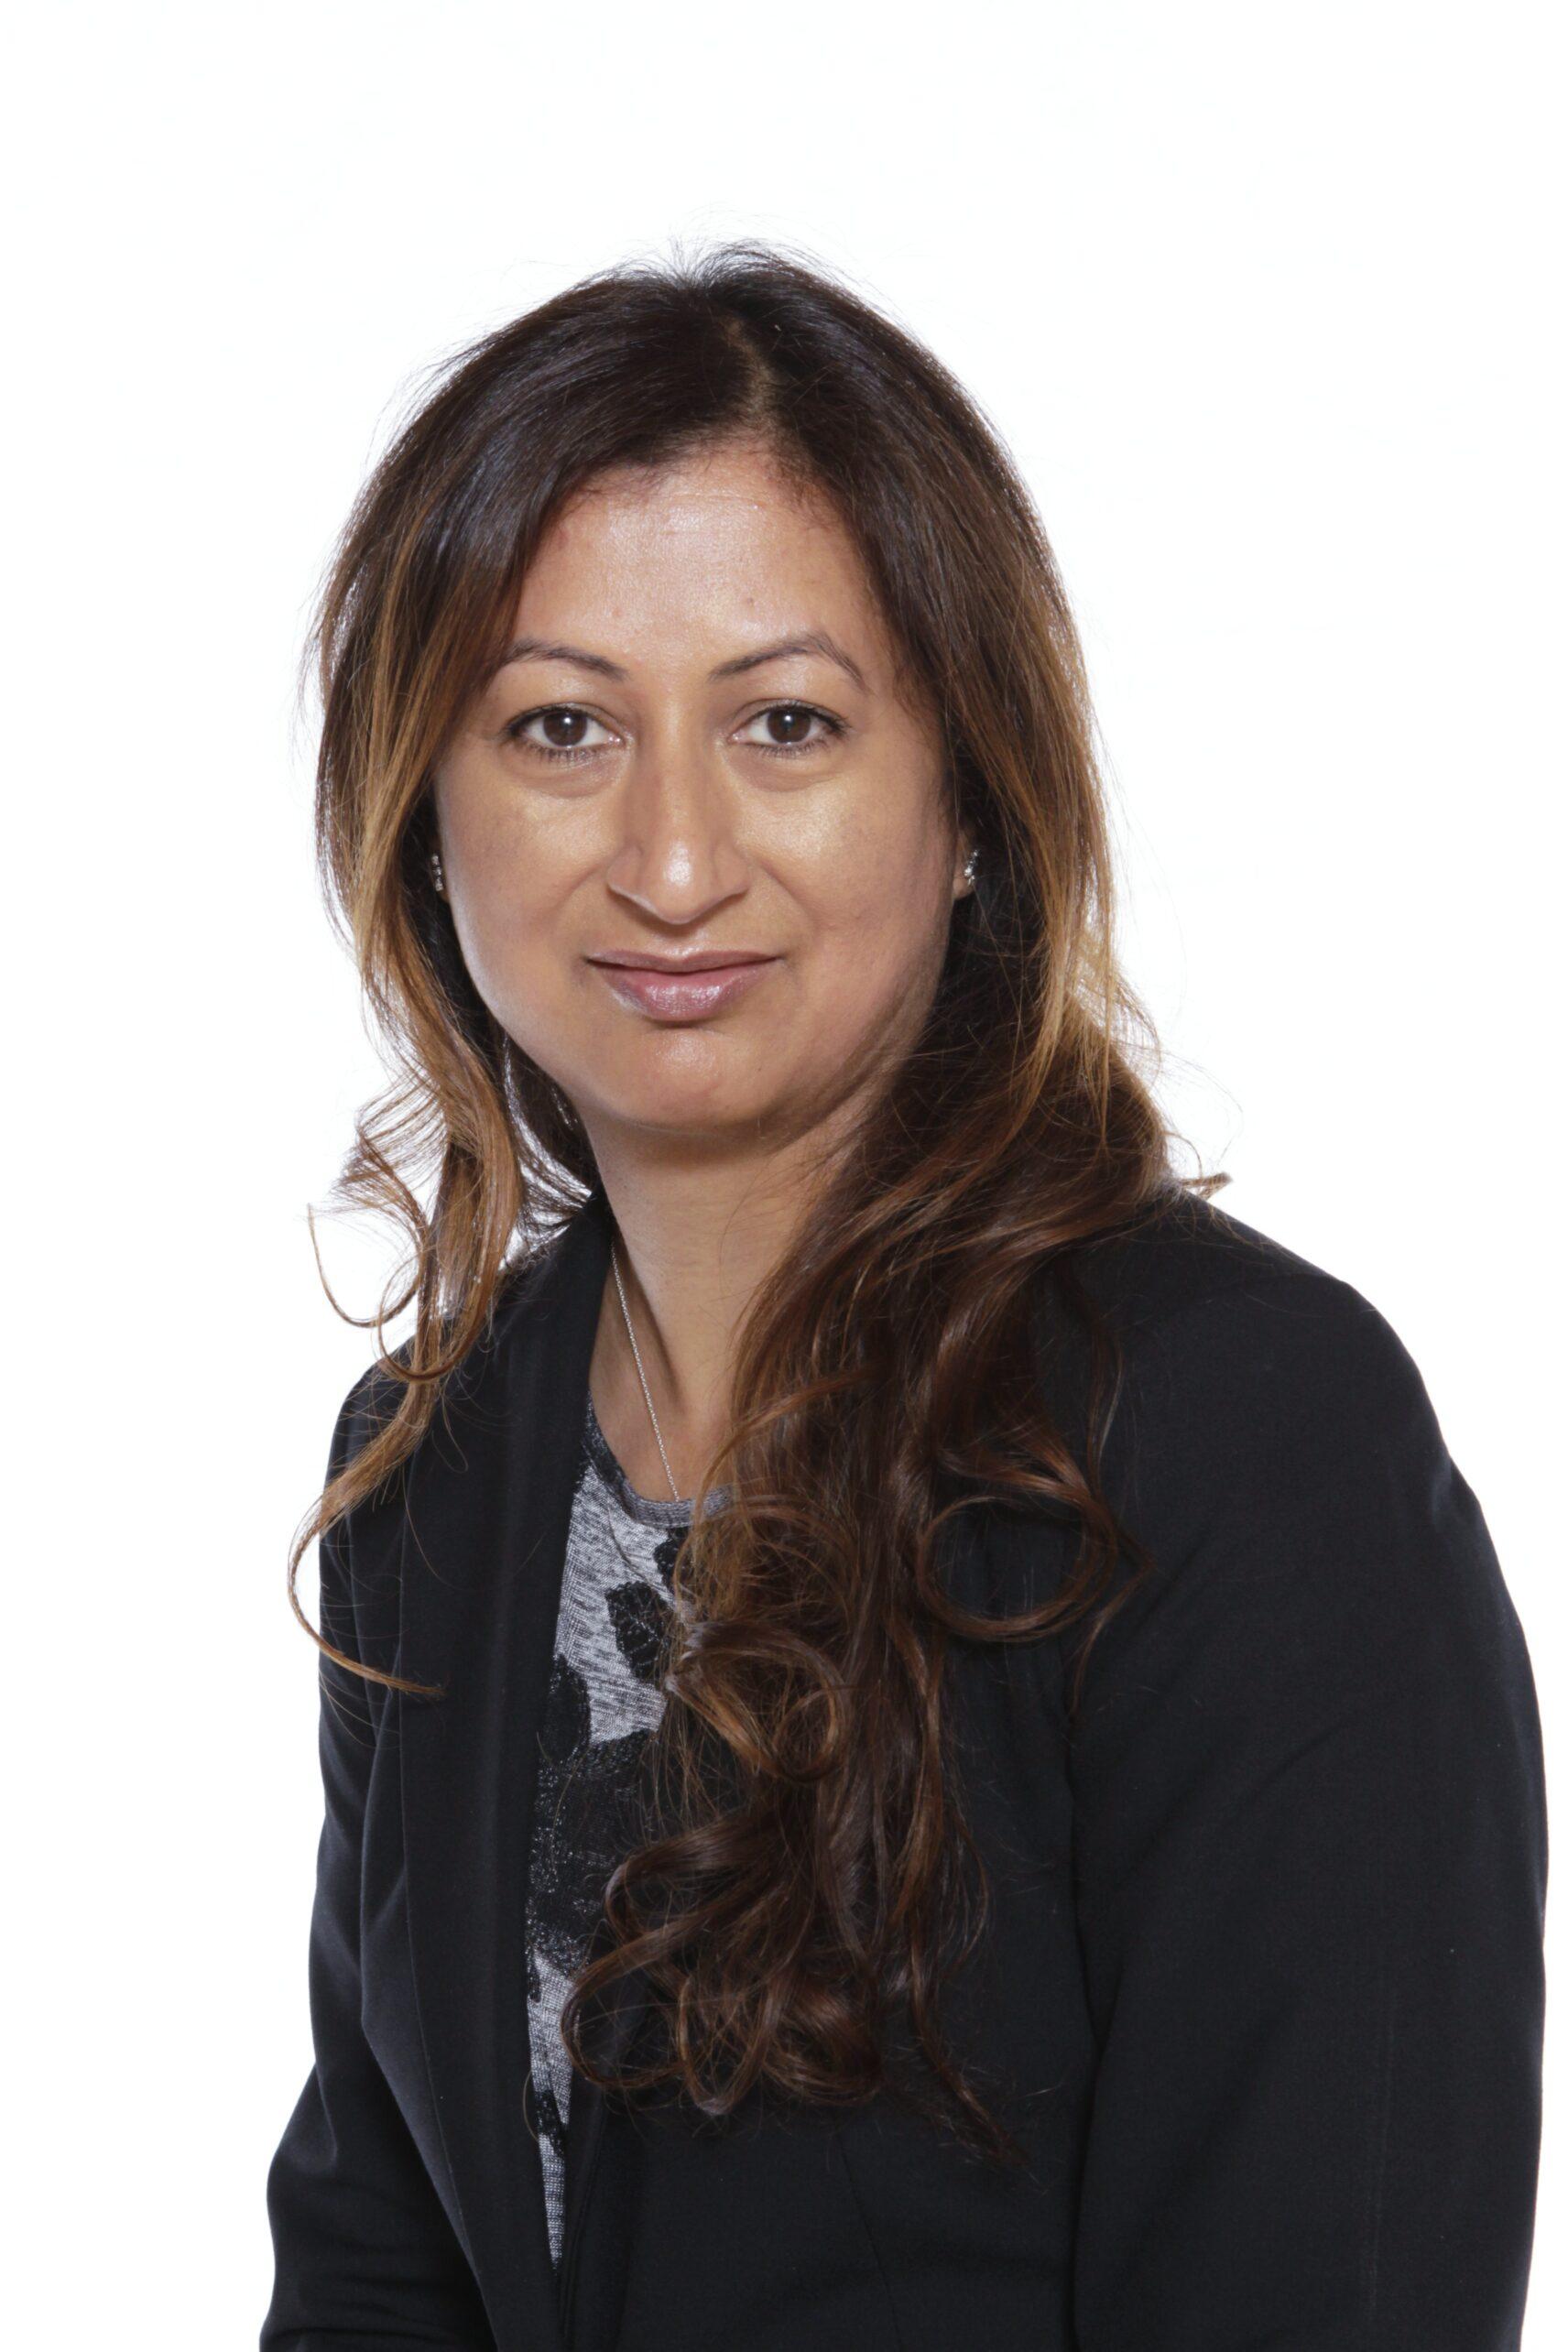 Ms Reena Shah